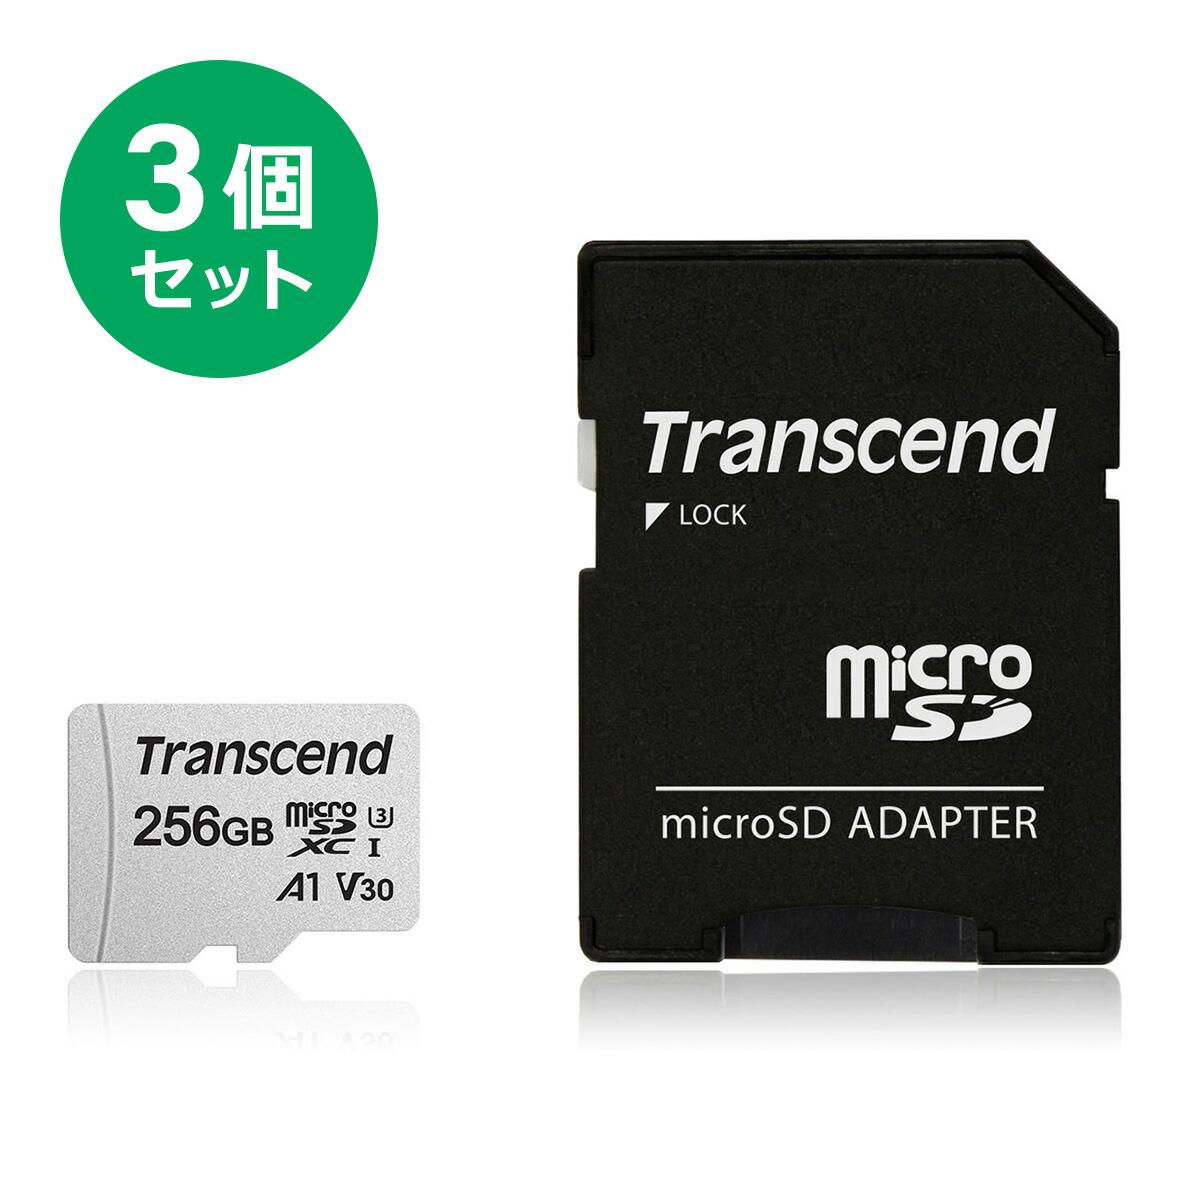 TS256GUSD300S-A ネコポス専用 送料無料 Transcend microSDカード 256GB Class10 5年保証 UHS-I U3 V30 マイクロSD 男女兼用 SD変換アダプタ付き microSDXC 卒業 SDカード入学 流行のアイテム A1 クラス10 U1